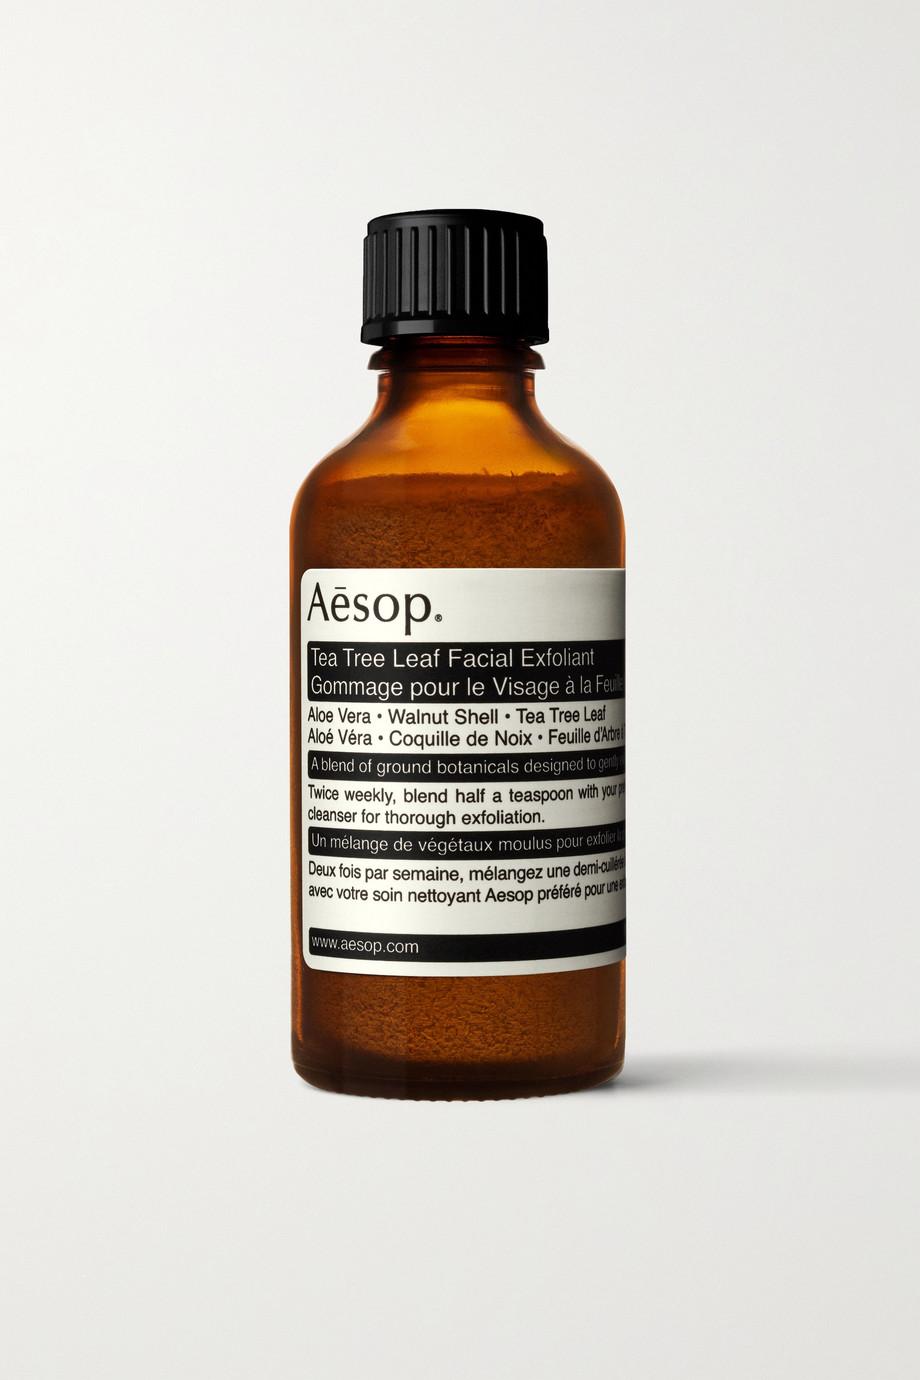 Aesop Tea Tree Leaf Facial Exfoliant, 32.5ml